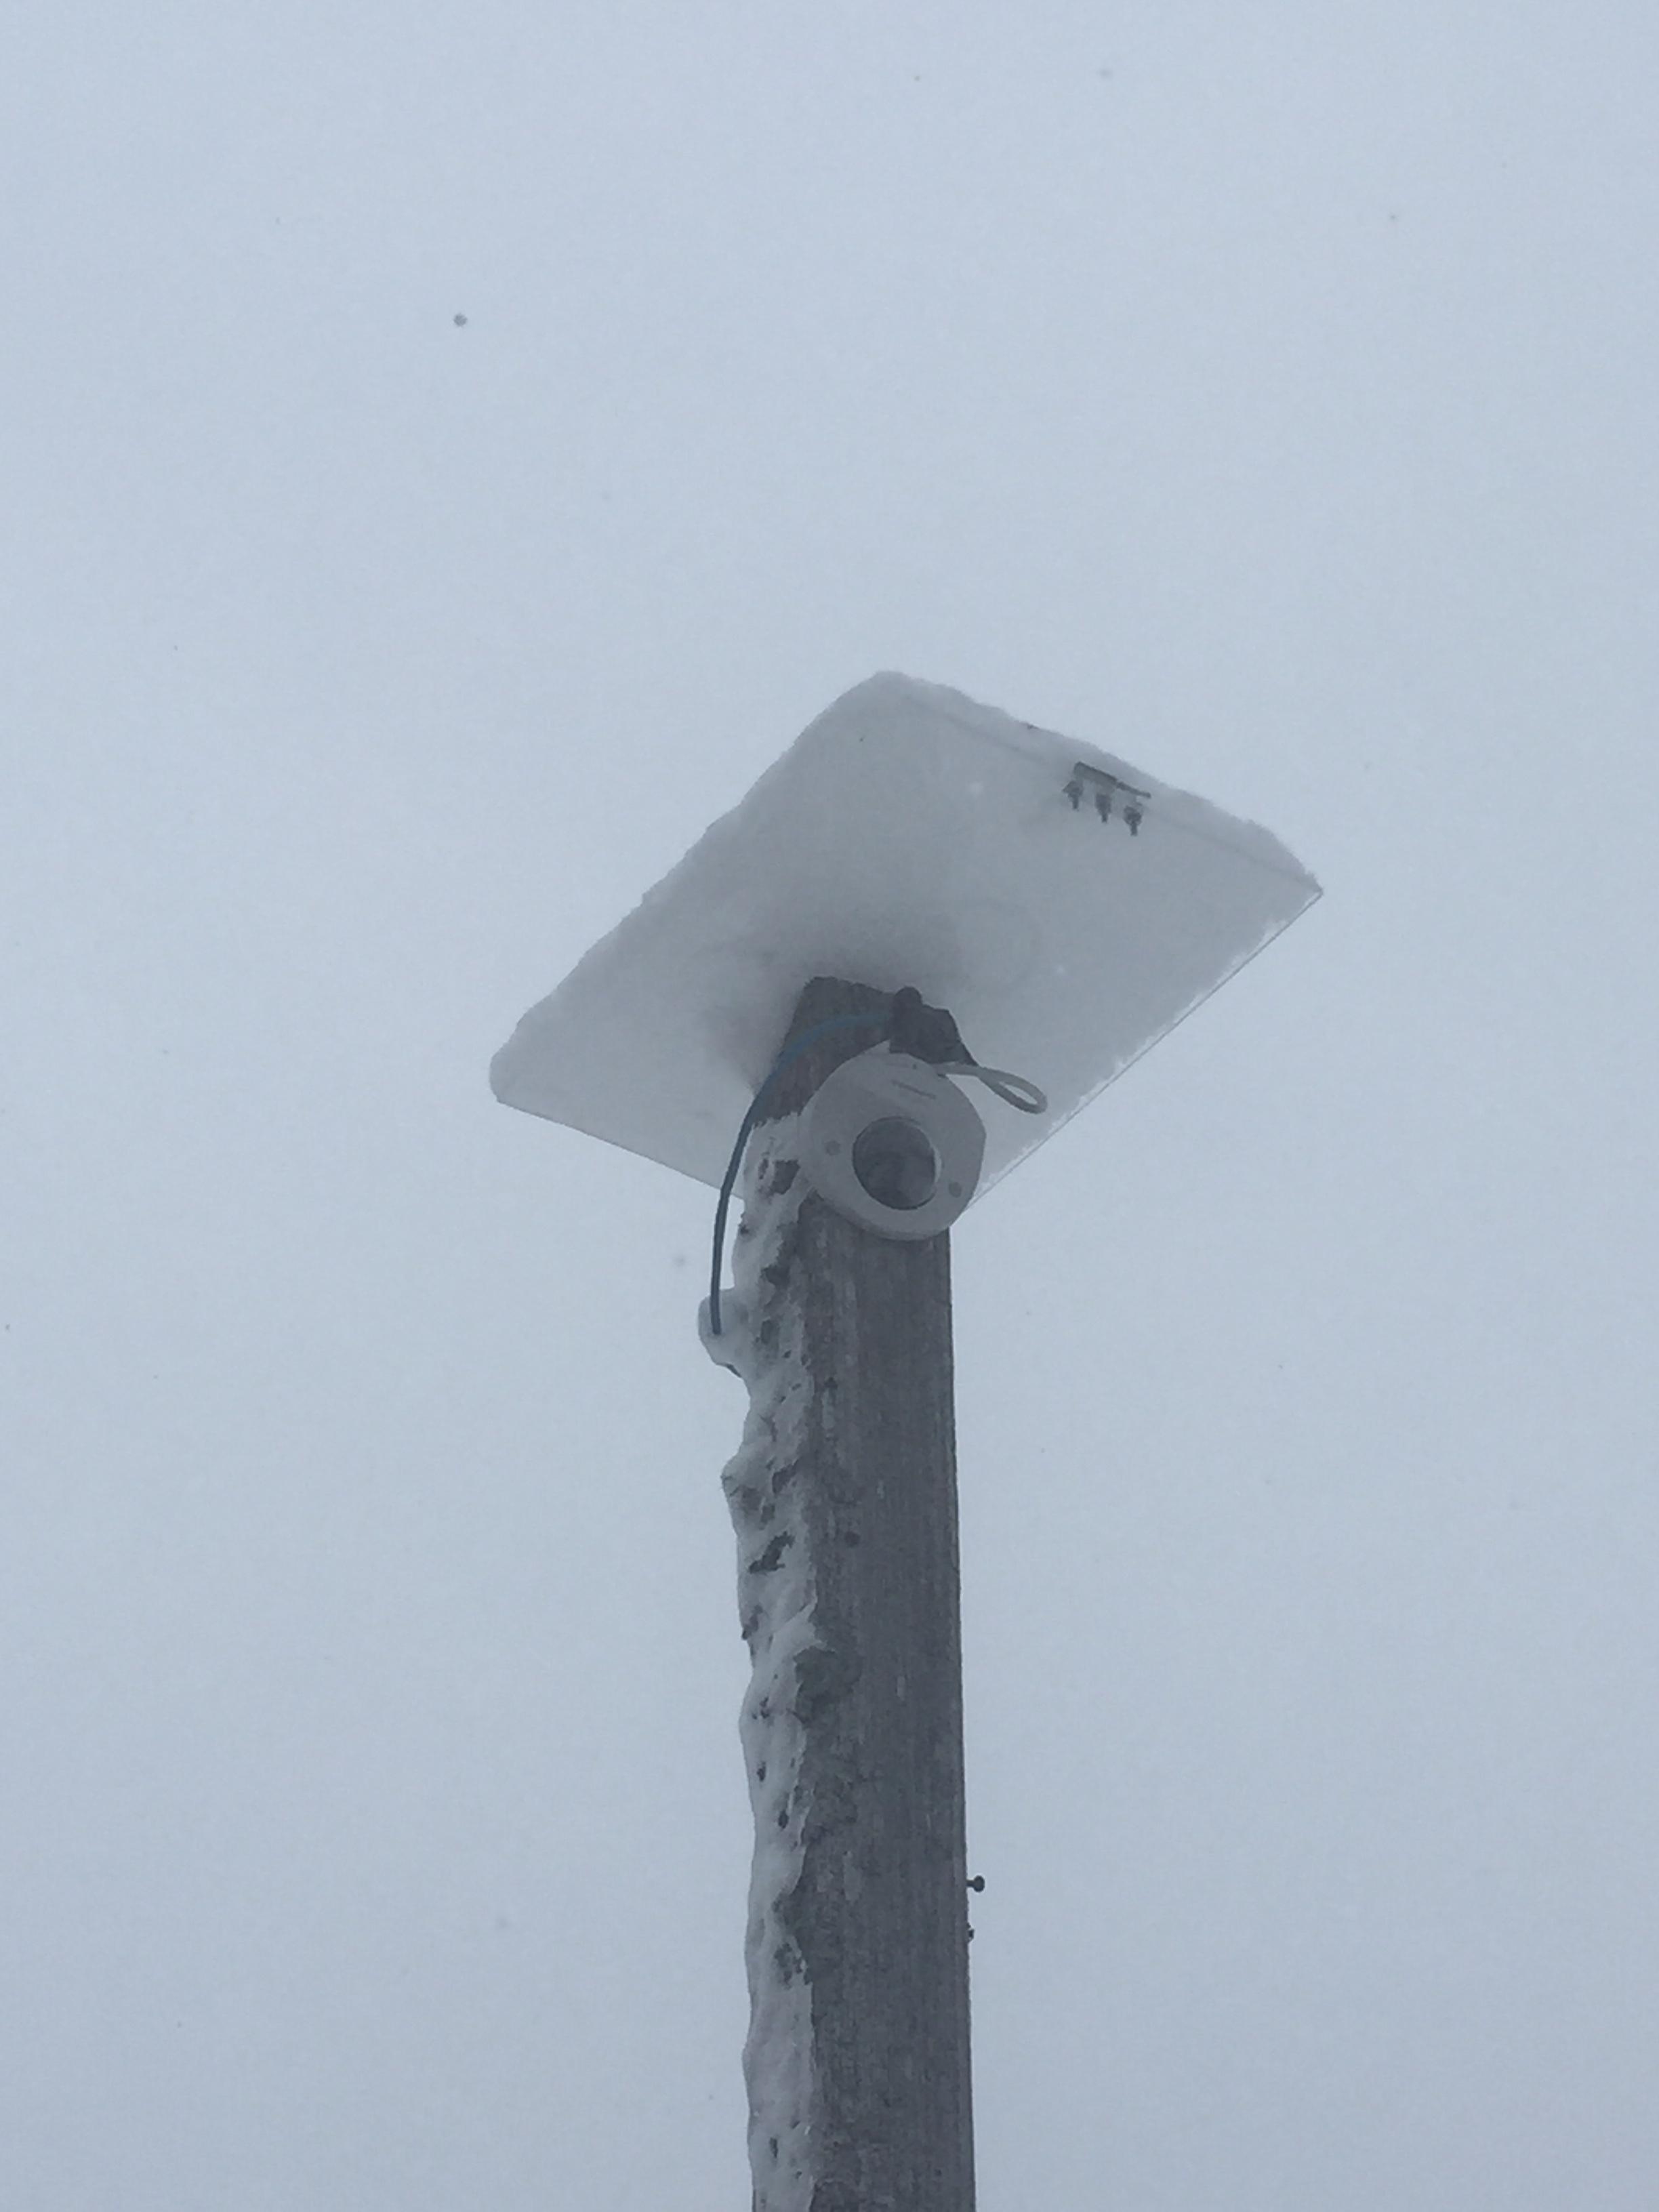 Ski lodge camera under solar panel